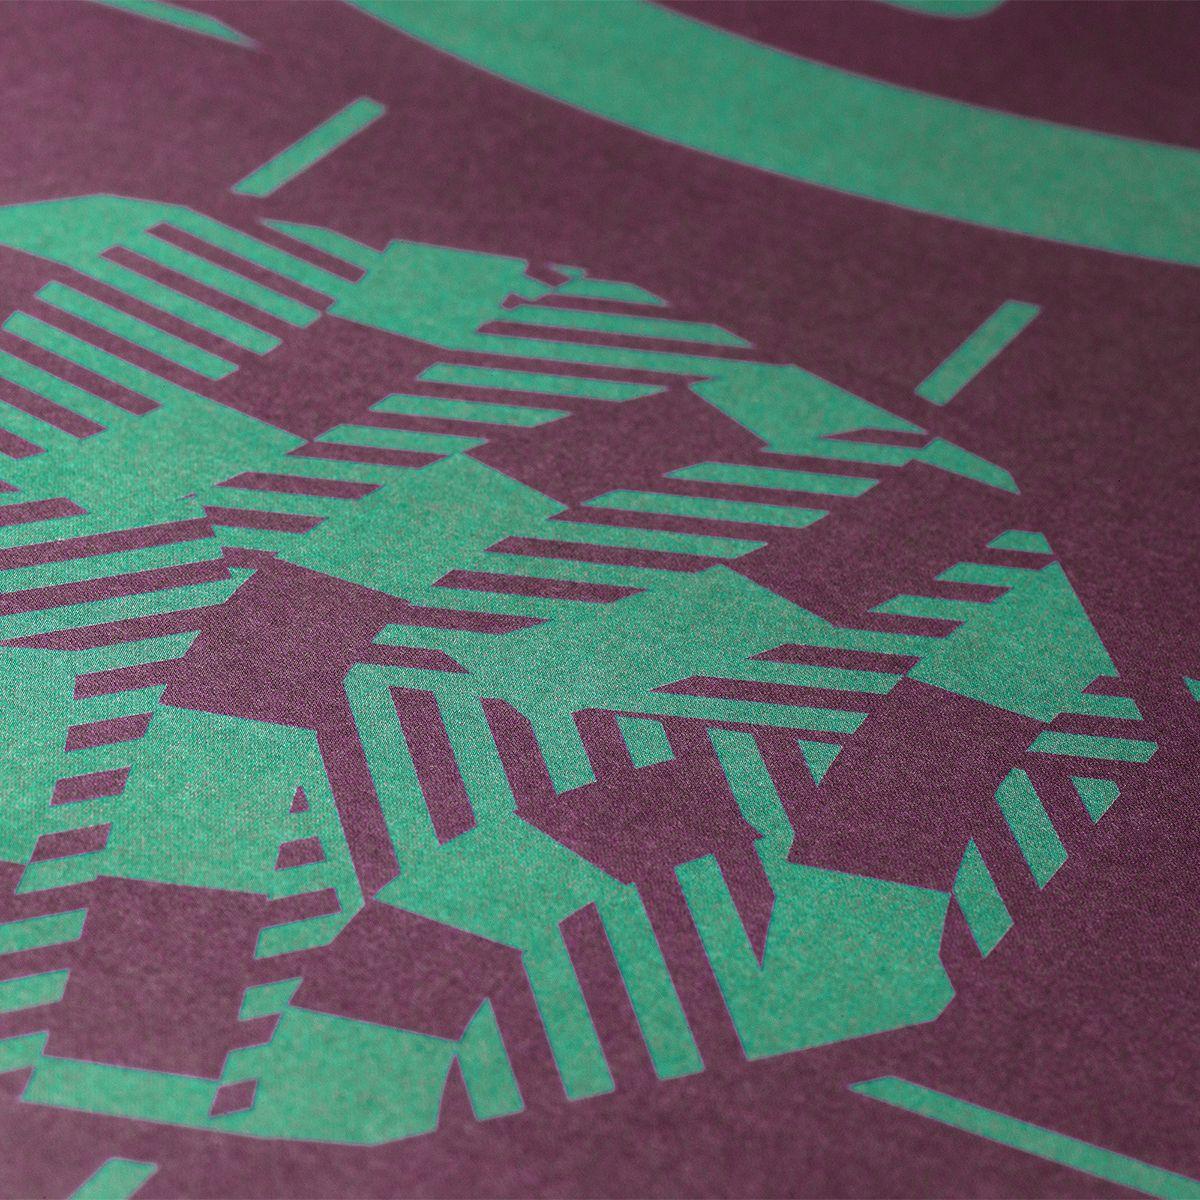 Print designed by Richard Hogg for Strut and Fibre's Ambassador Collection.